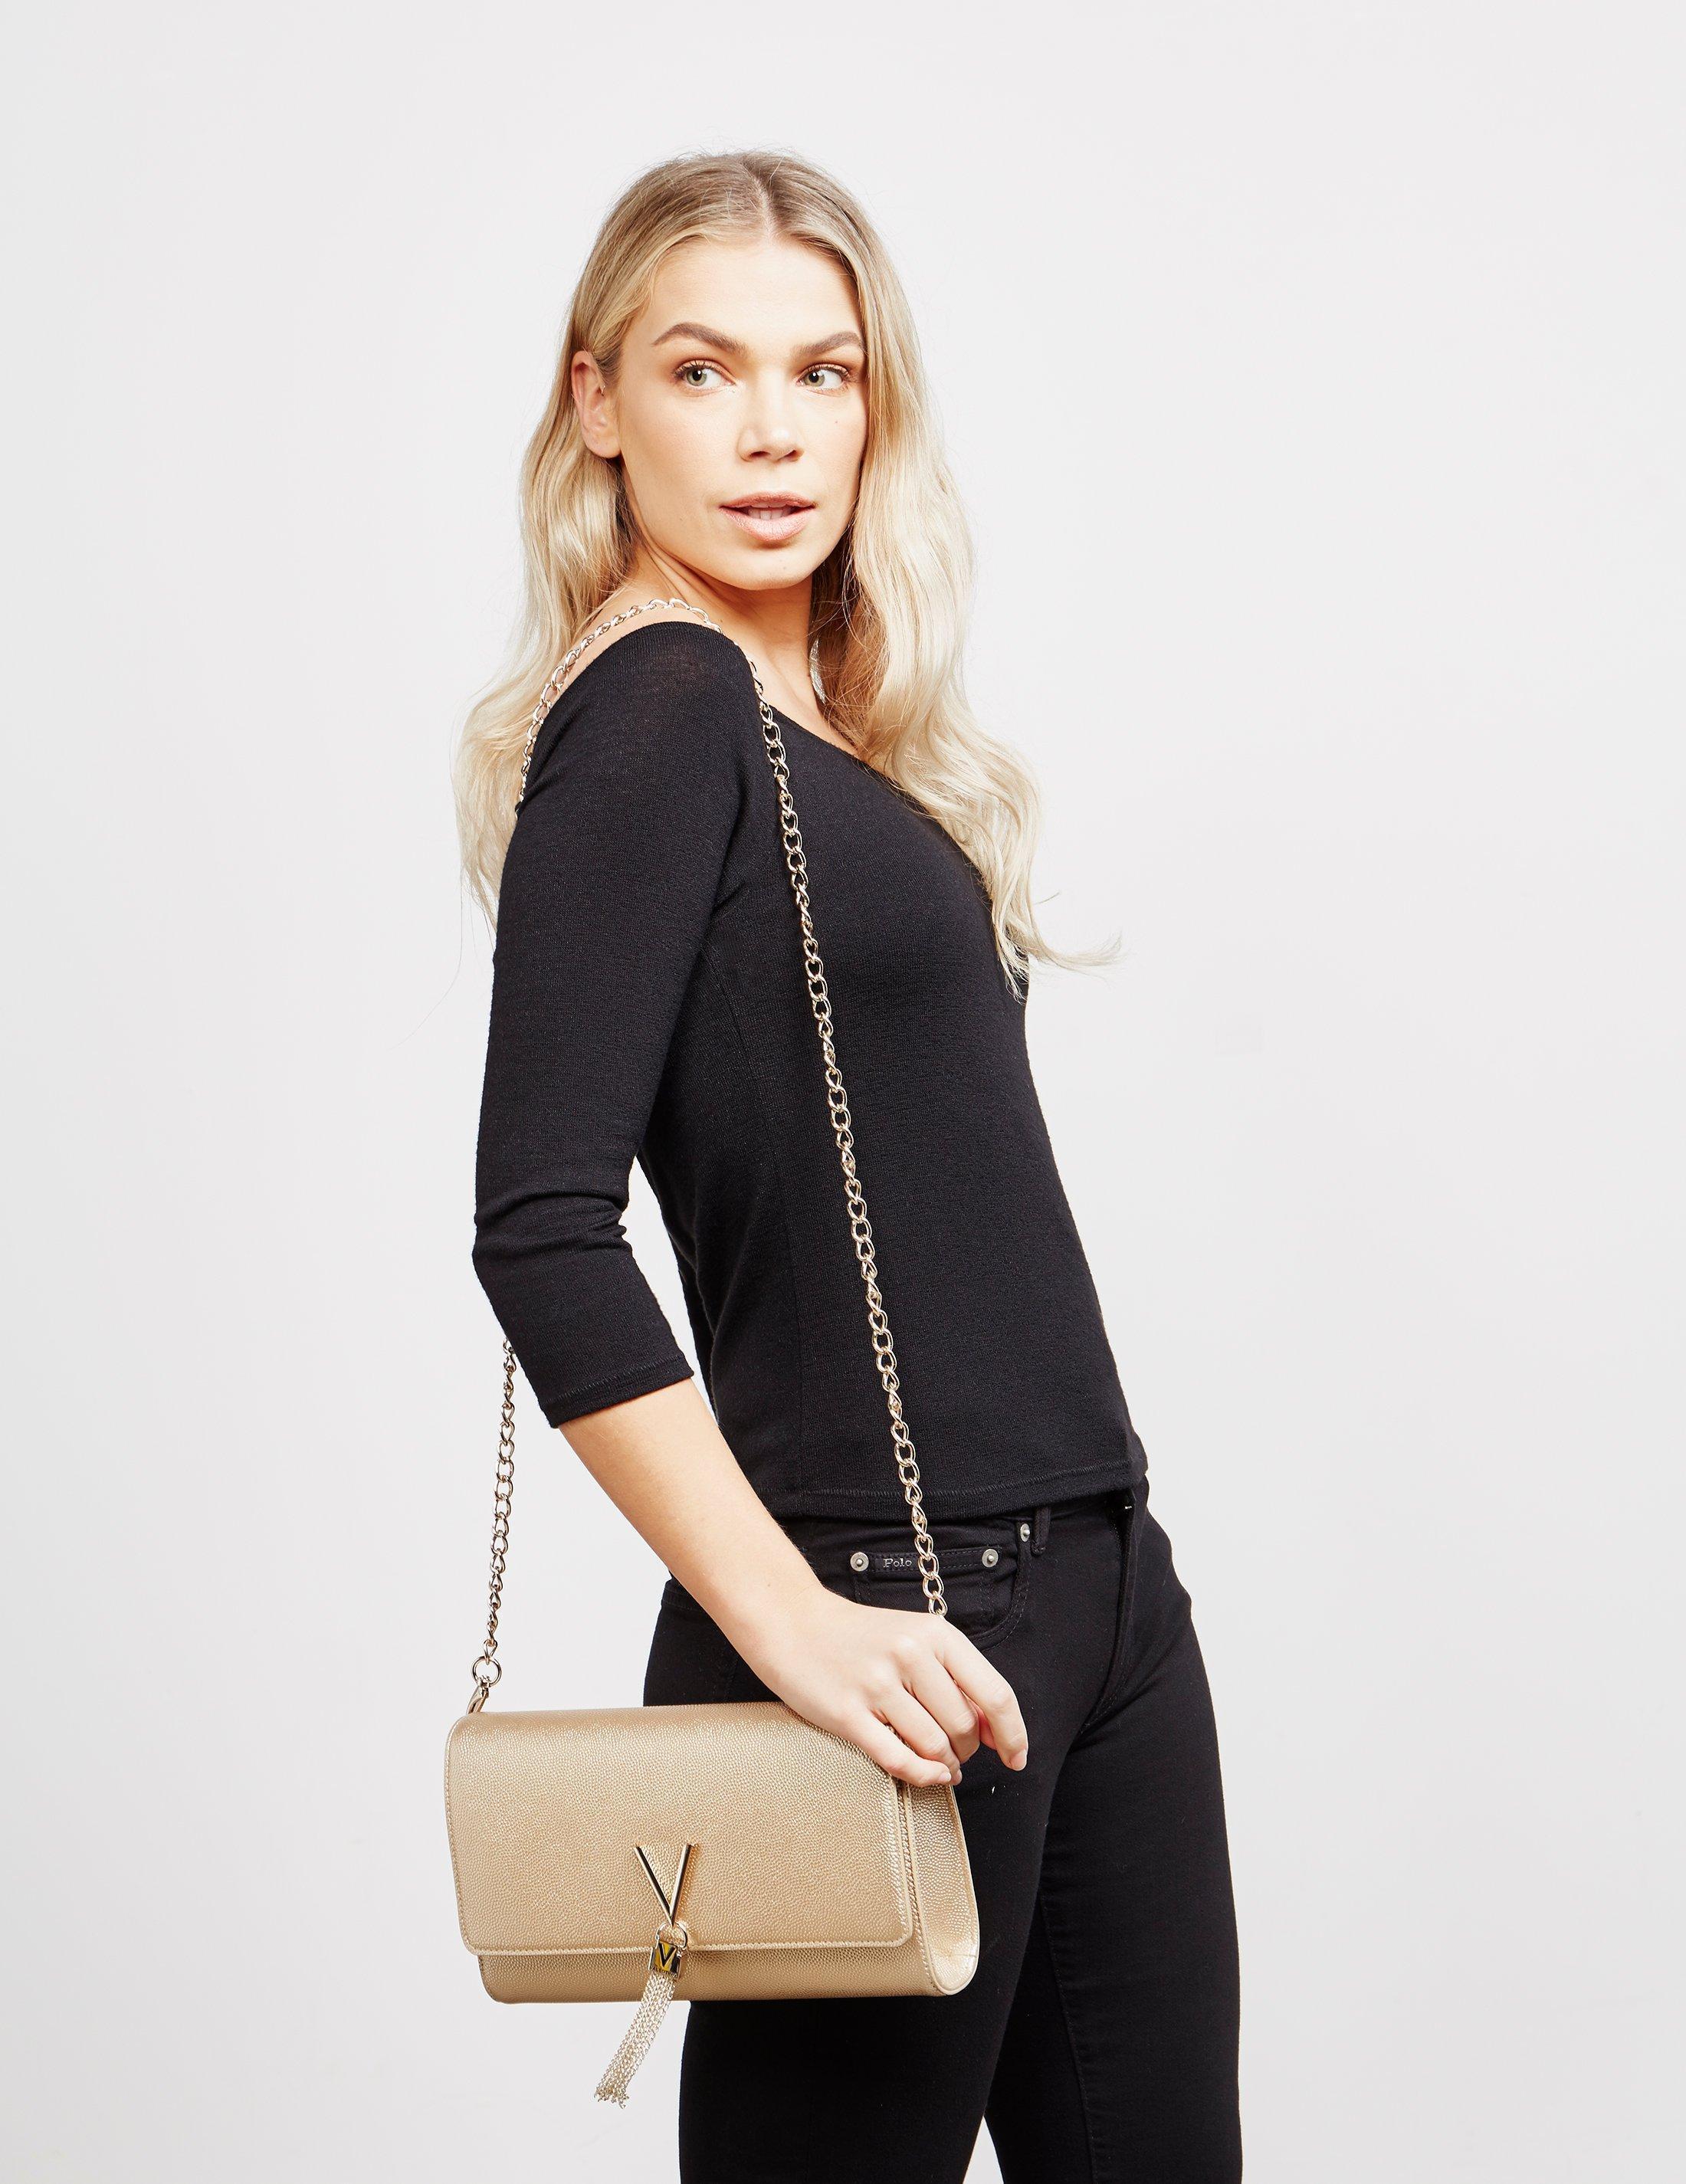 Valentino By Mario Valentino Womens Divina Clutch Bags Handbag Gold